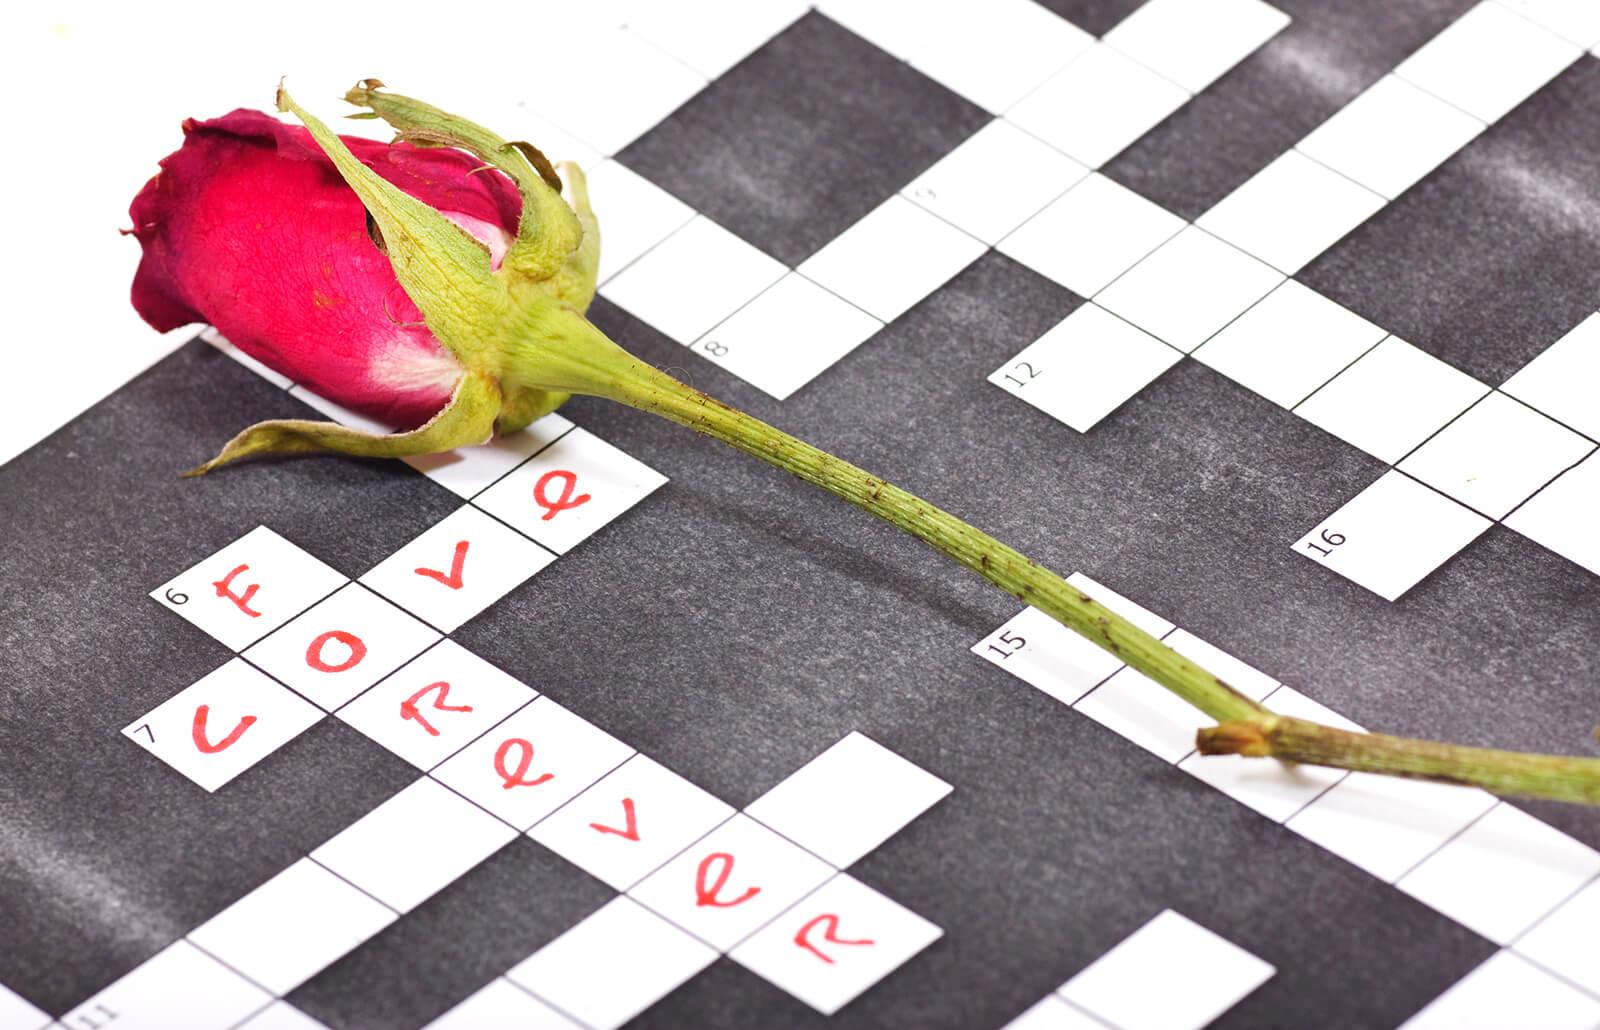 Free Printable Bridal Shower Games | Lovetoknow - Free Printable Bridal Shower Crossword Puzzle